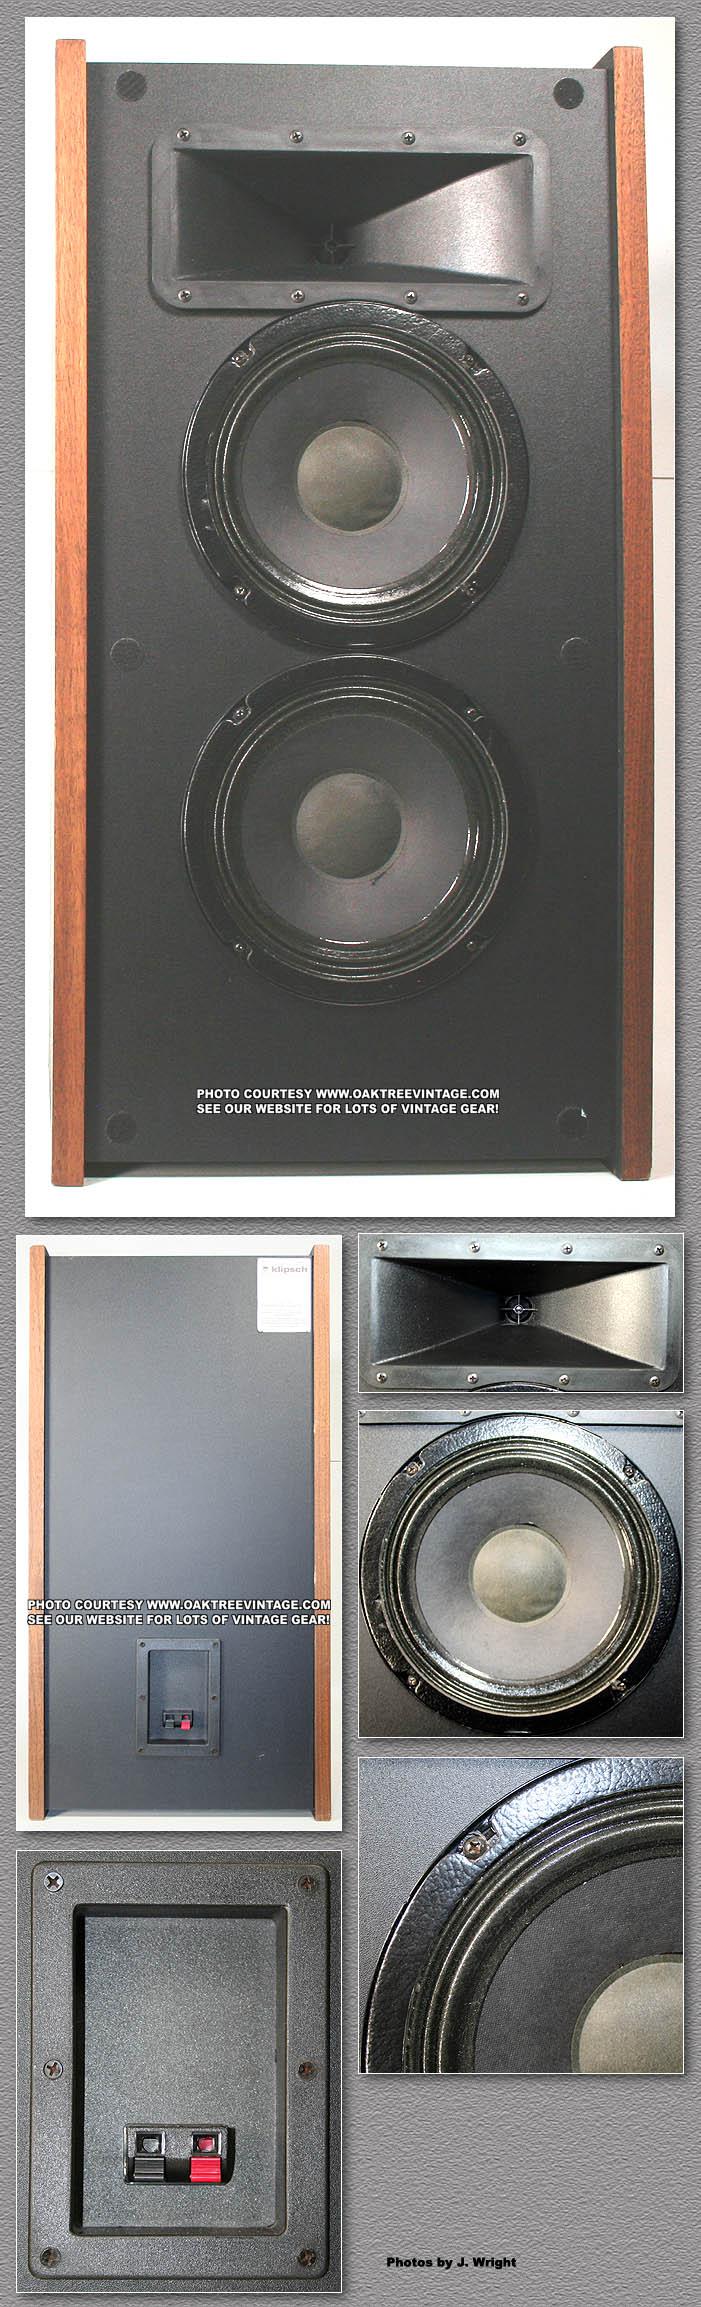 Klipsch Replacement Speaker Parts / Spares